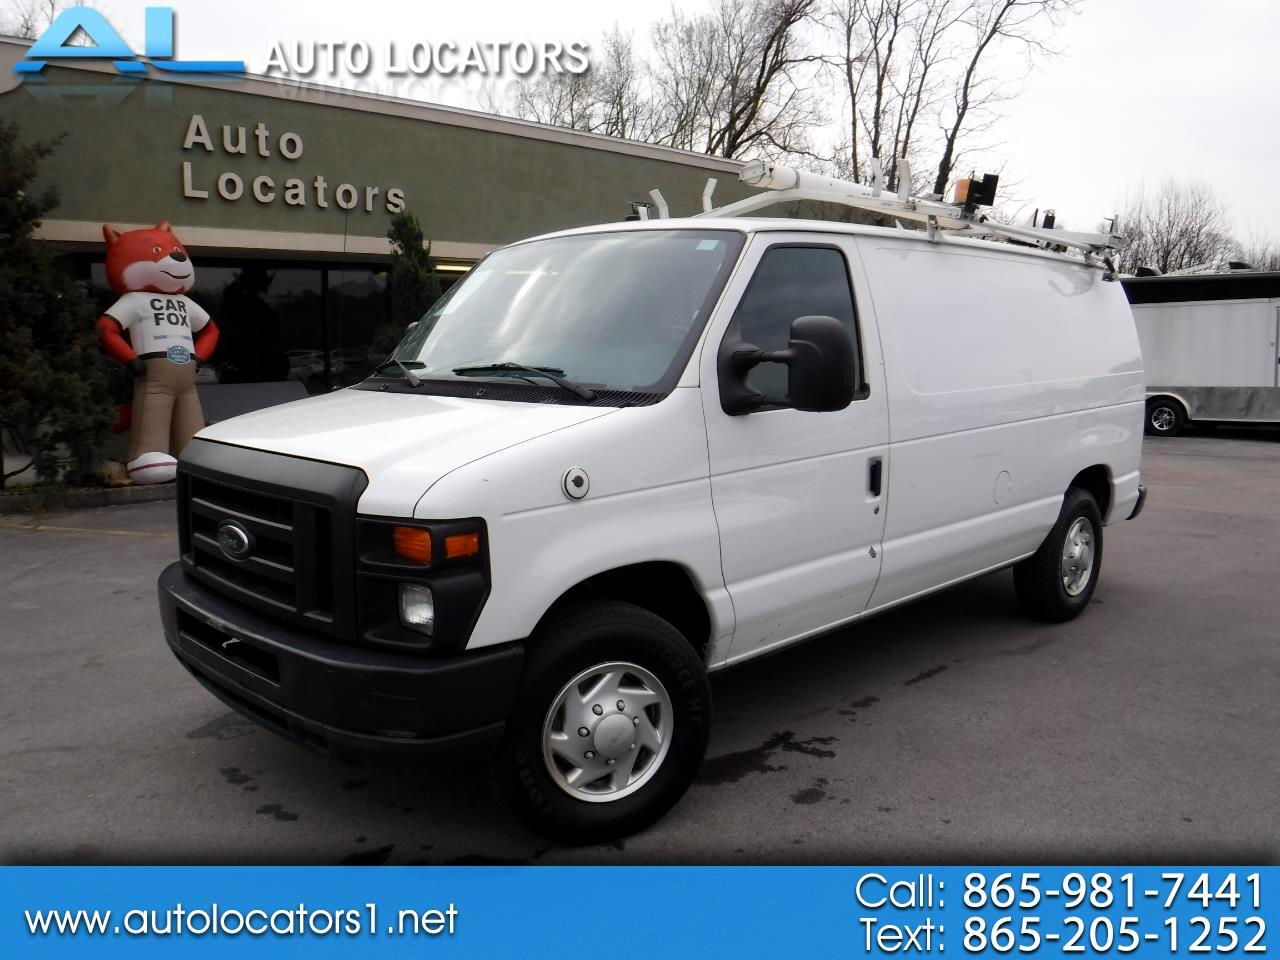 2010 Ford Econoline Cargo Van E-250 Recreational